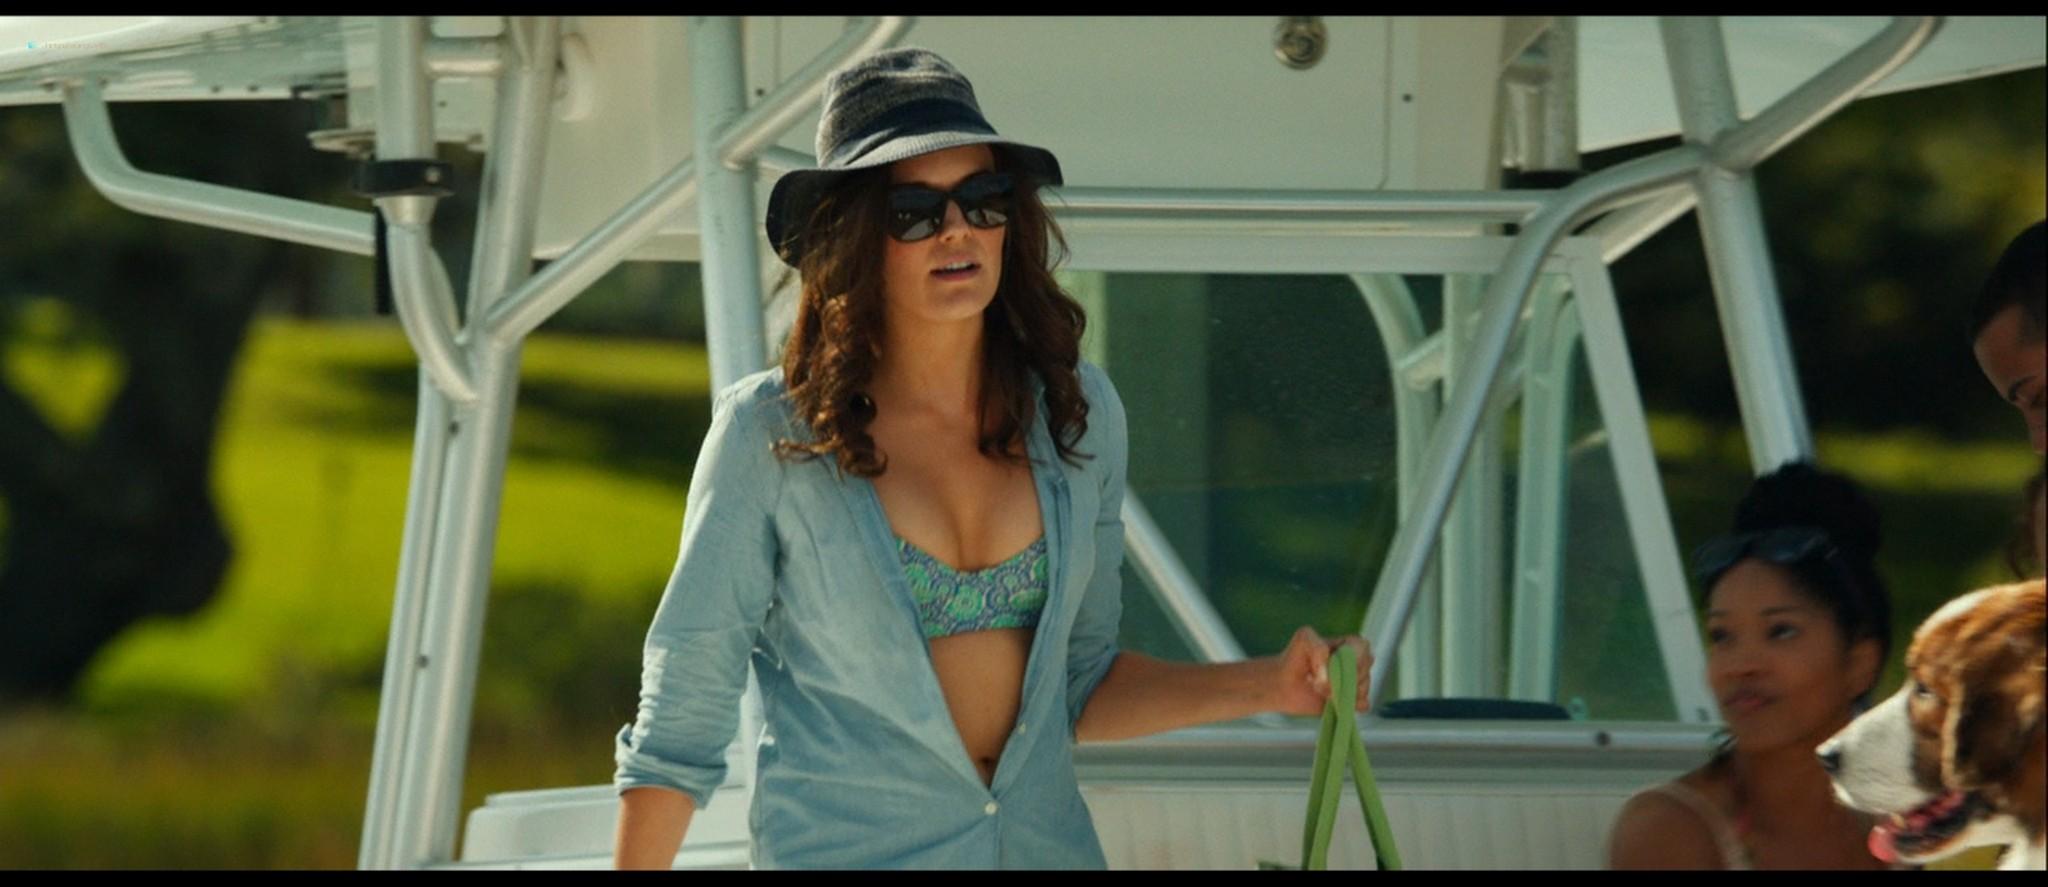 Teresa Palmer hot bikini and Maggie Grace, Alexandra Daddario hot too - The Choice (2016) HD 1080p BluRay (15)